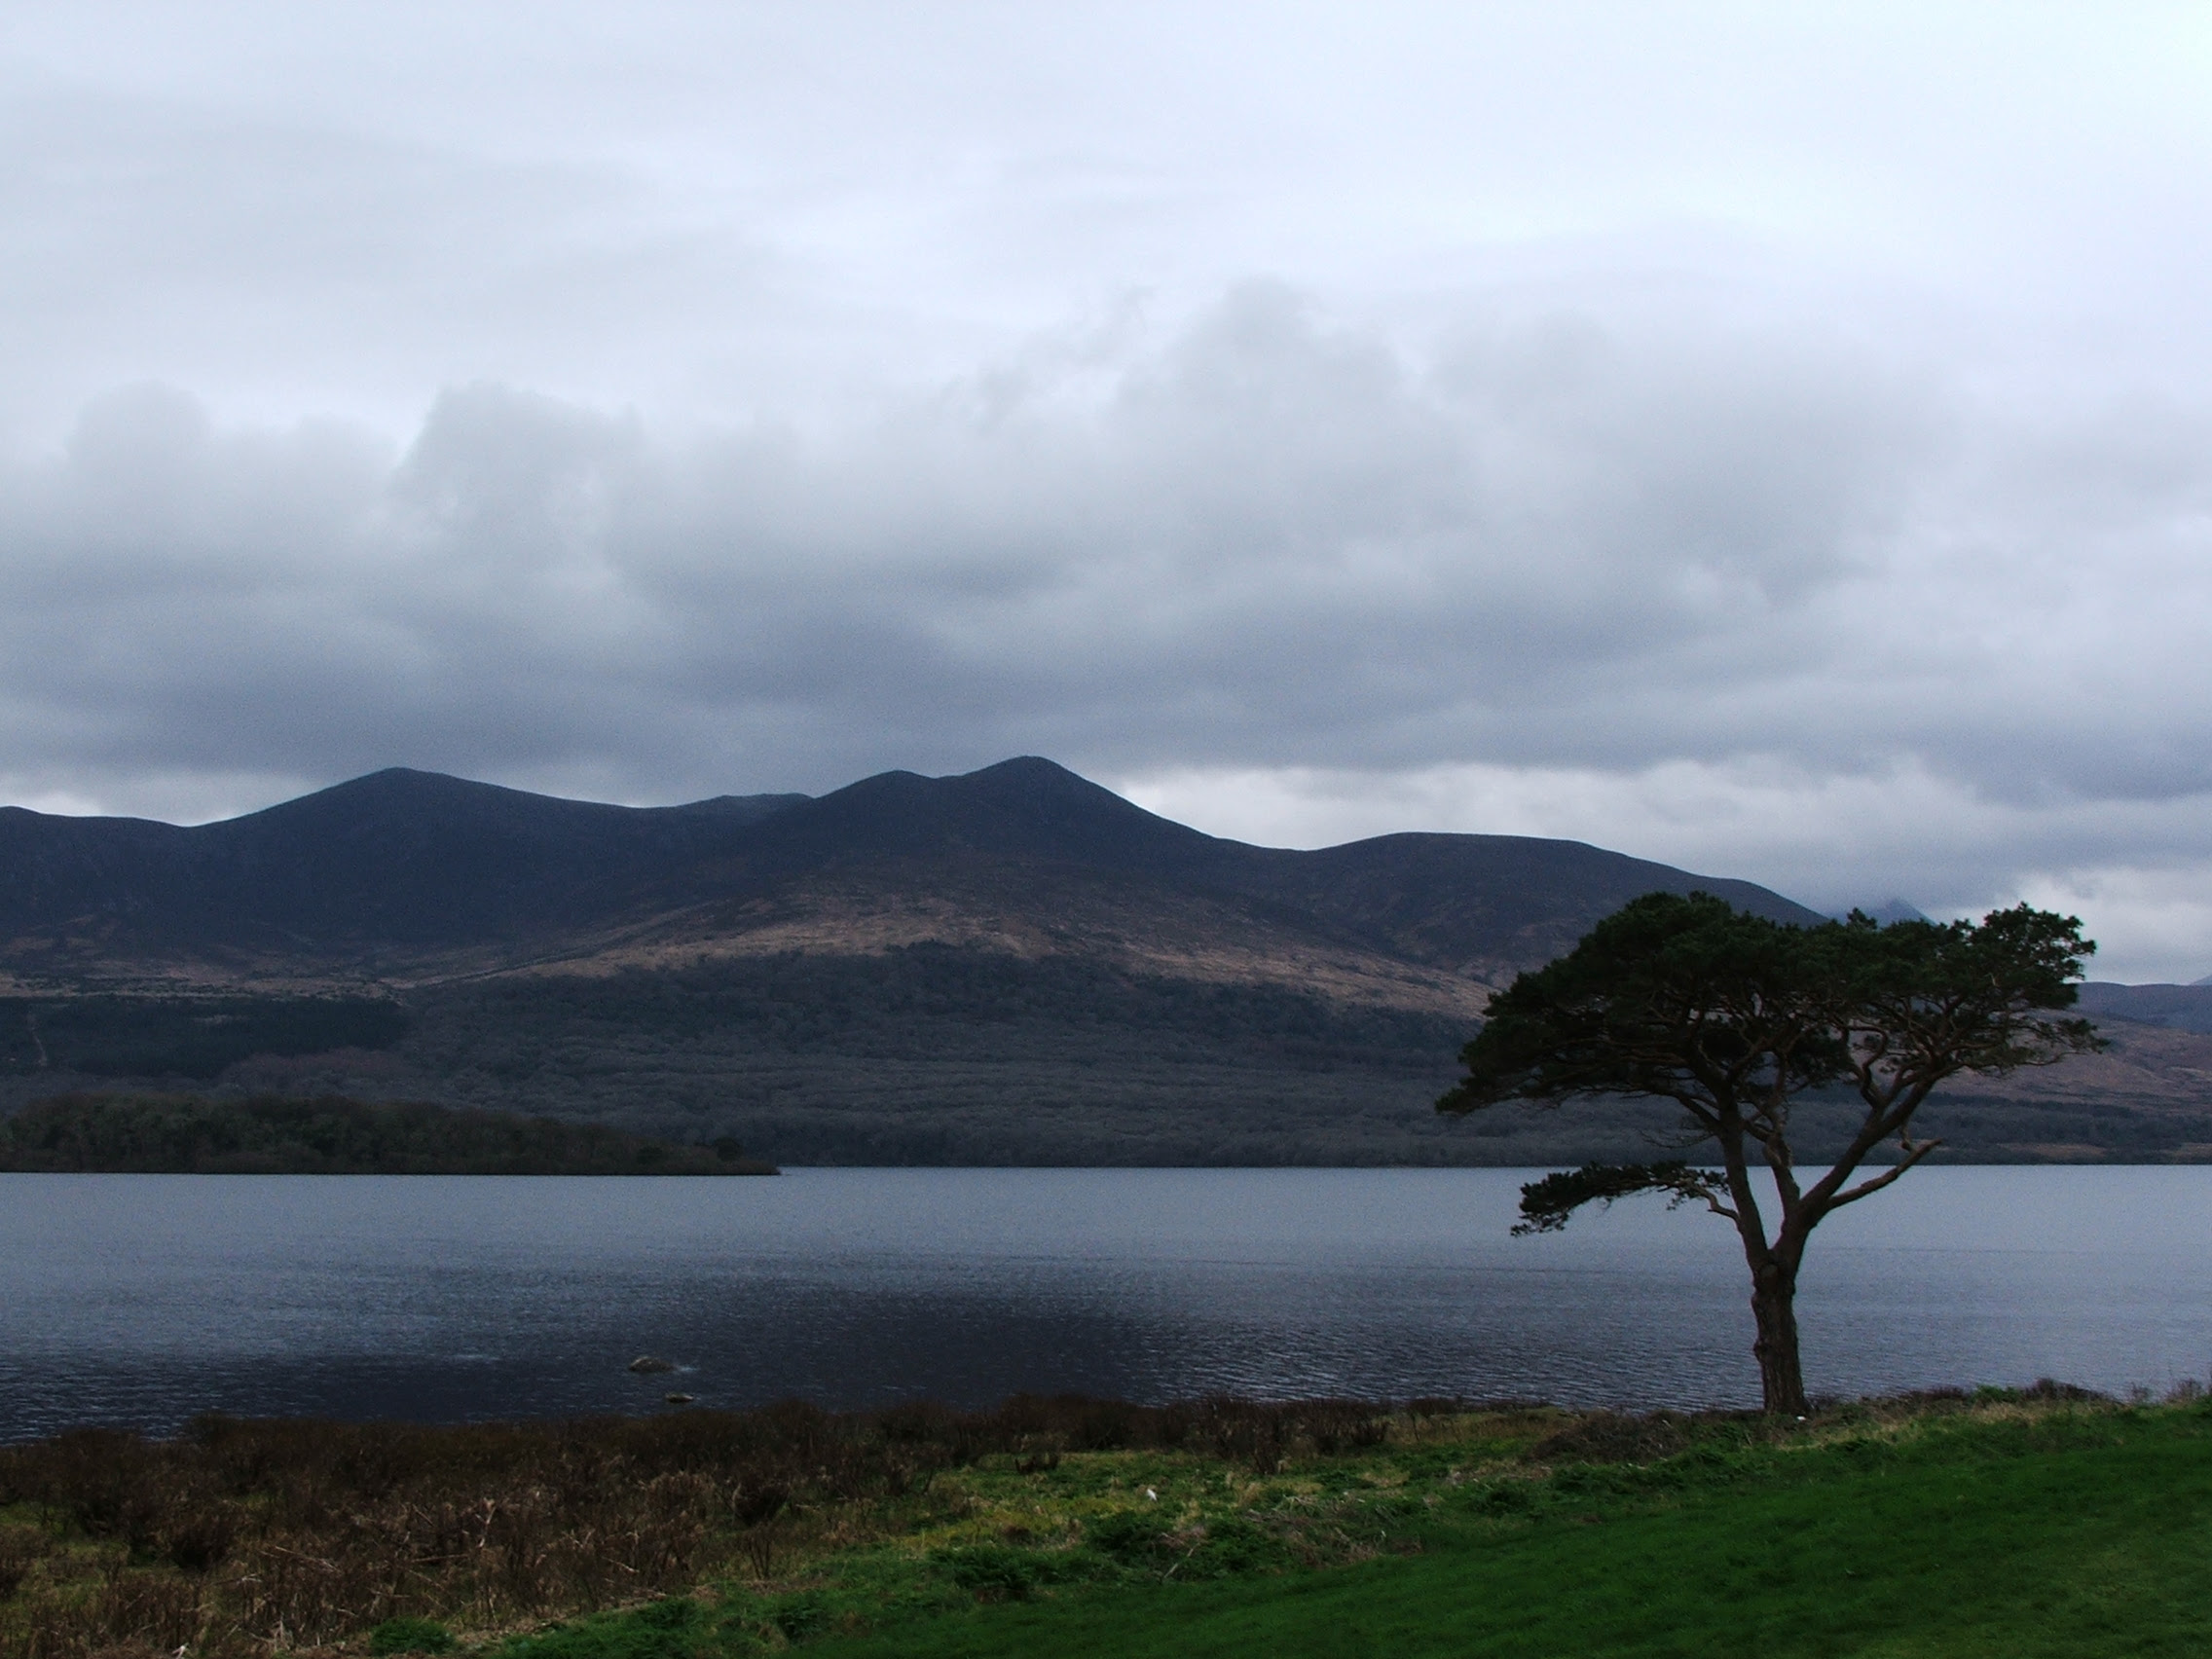 http://upload.wikimedia.org/wikipedia/commons/6/6b/Lakes_of_killarney.jpg